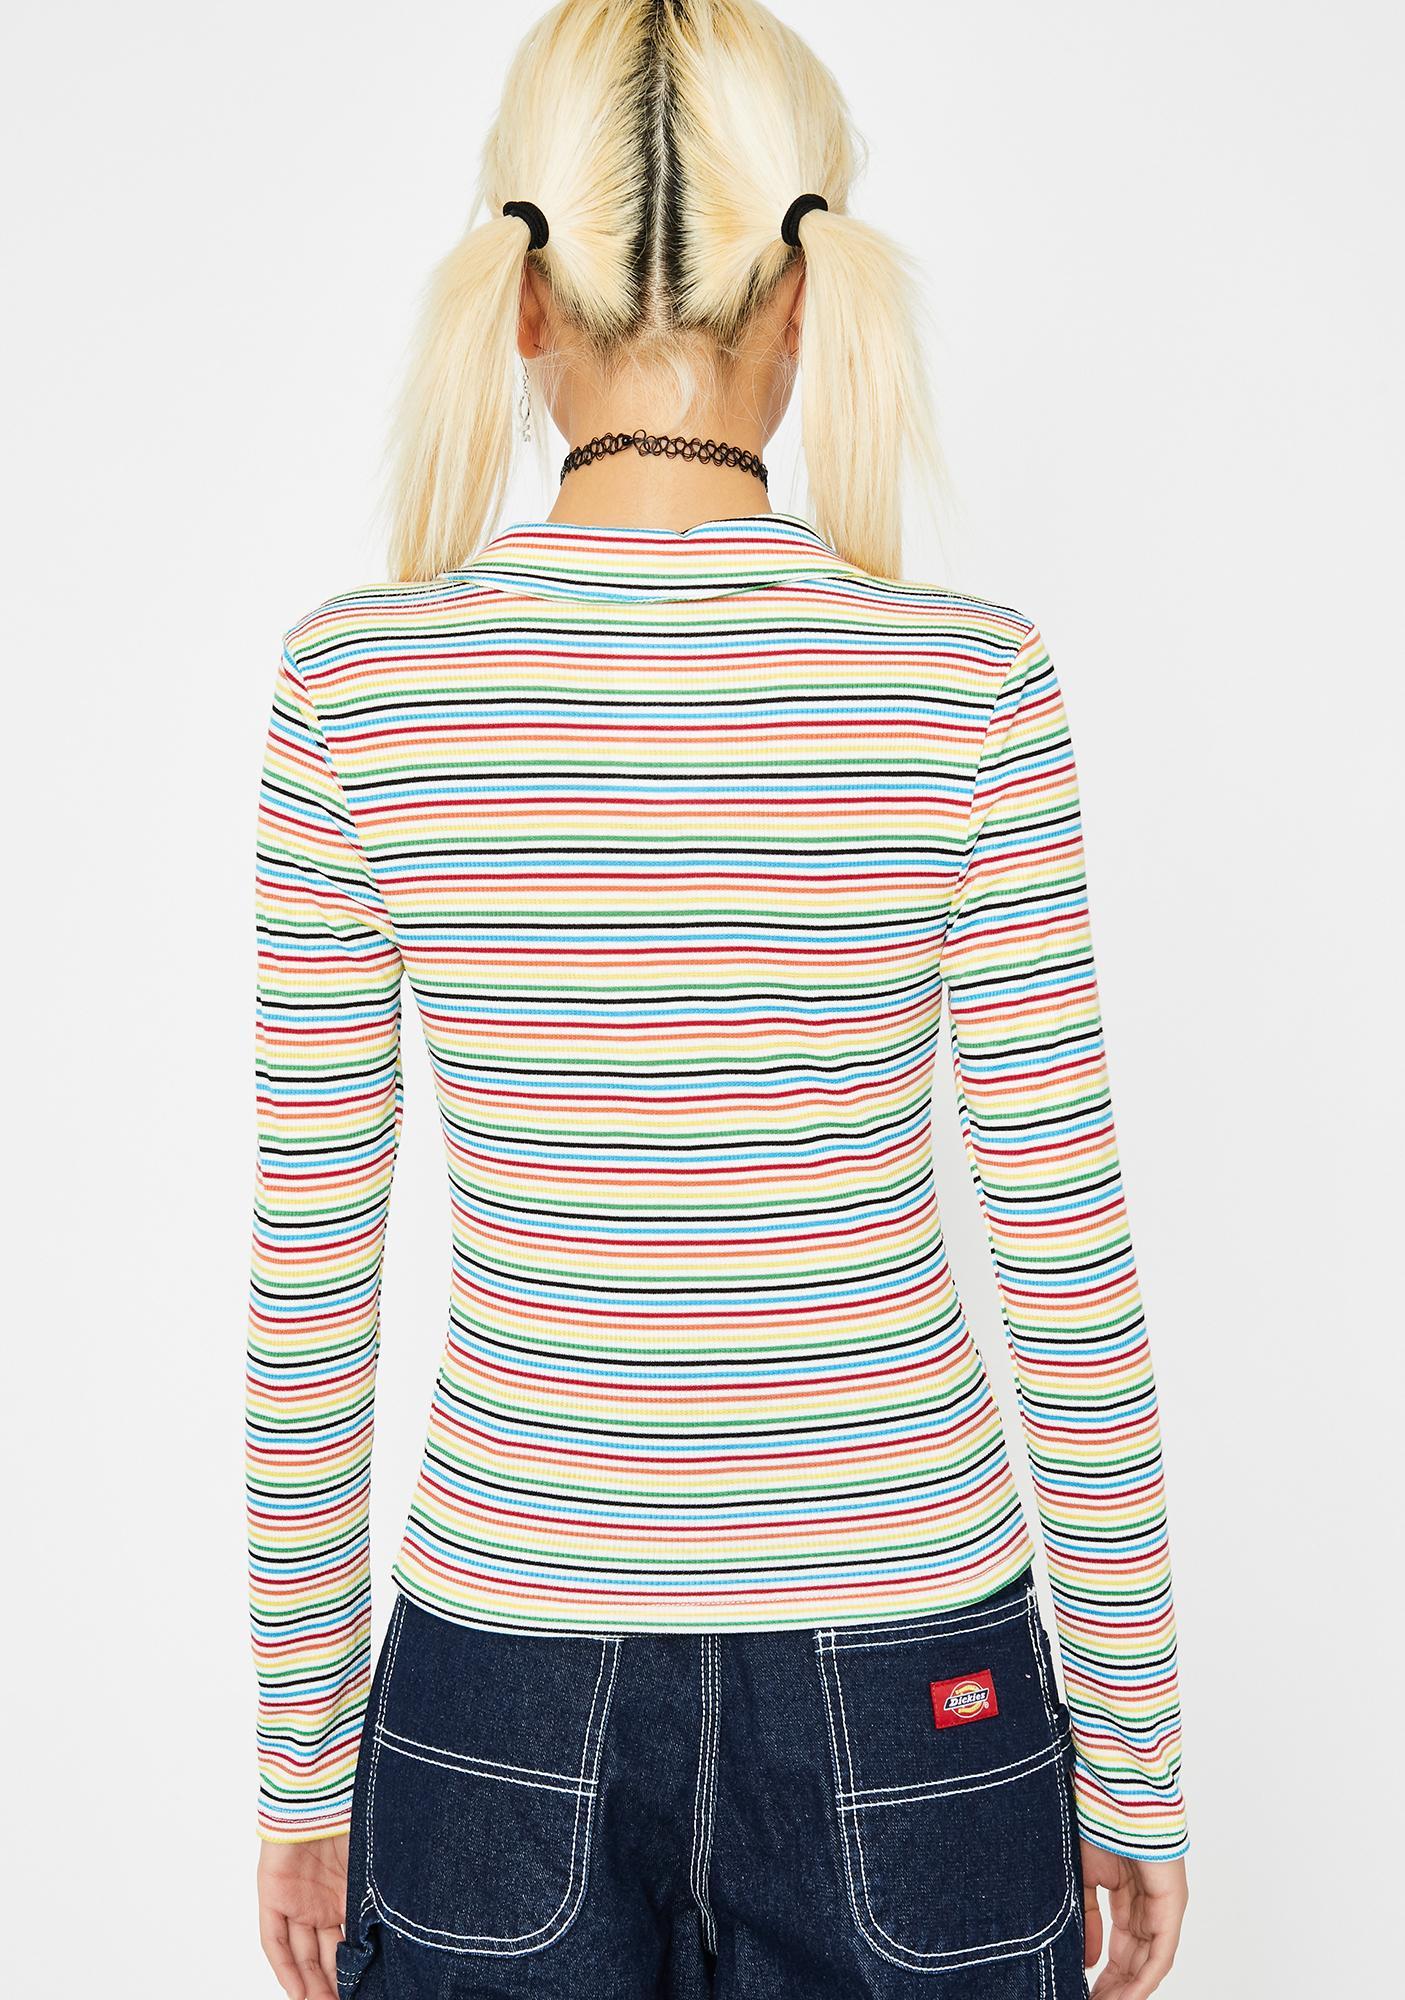 Spin Sugar Rainbow Top